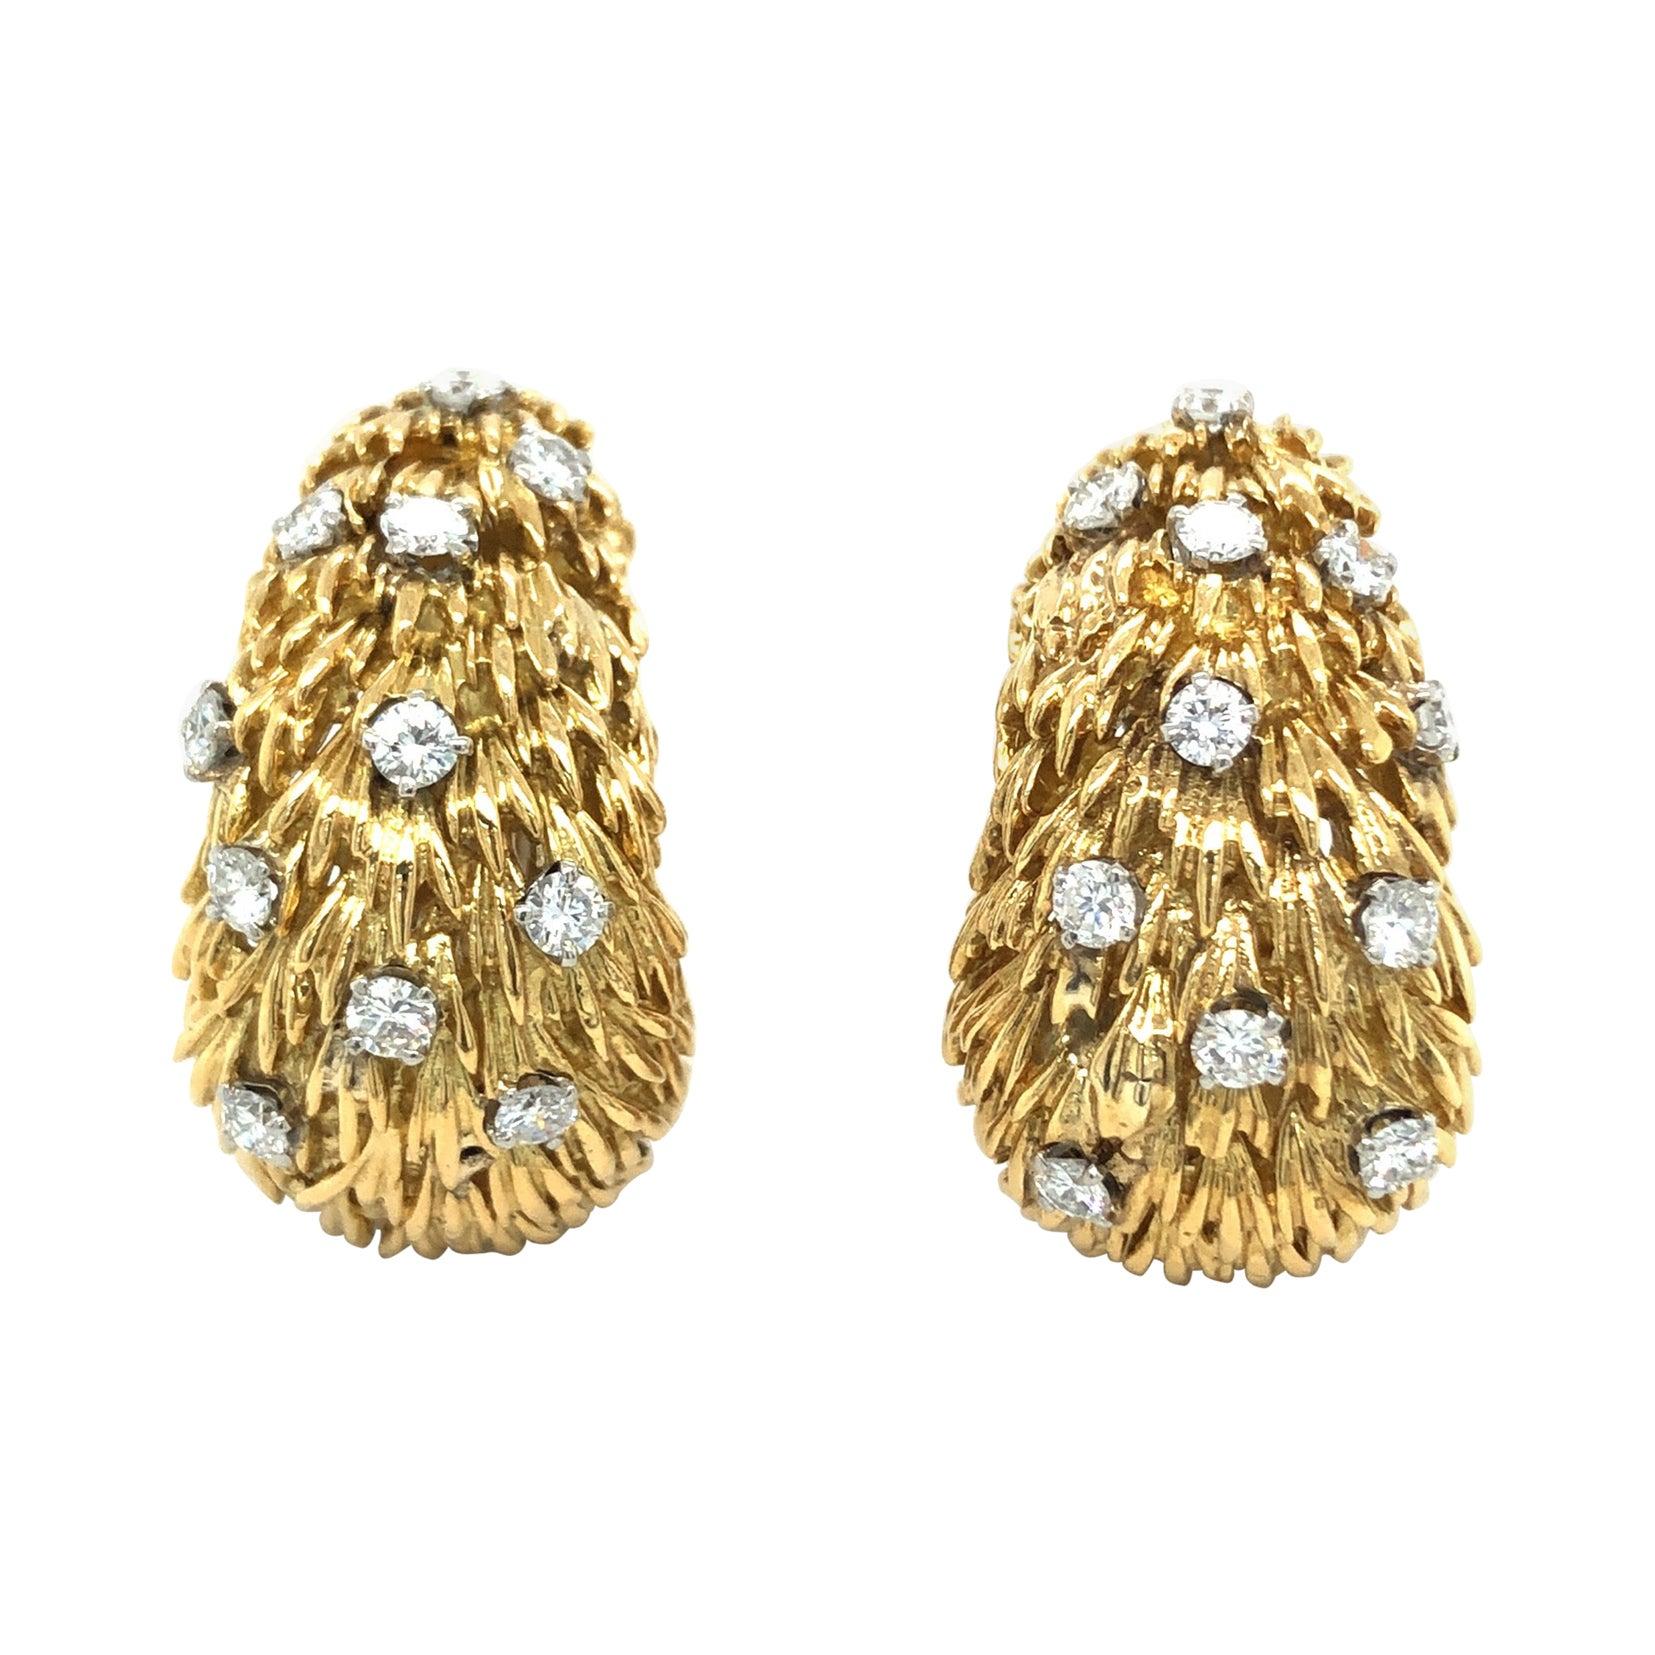 David Webb 18 Karat Yellow Gold Diamond Vintage Half Hoop Clip-On Earrings